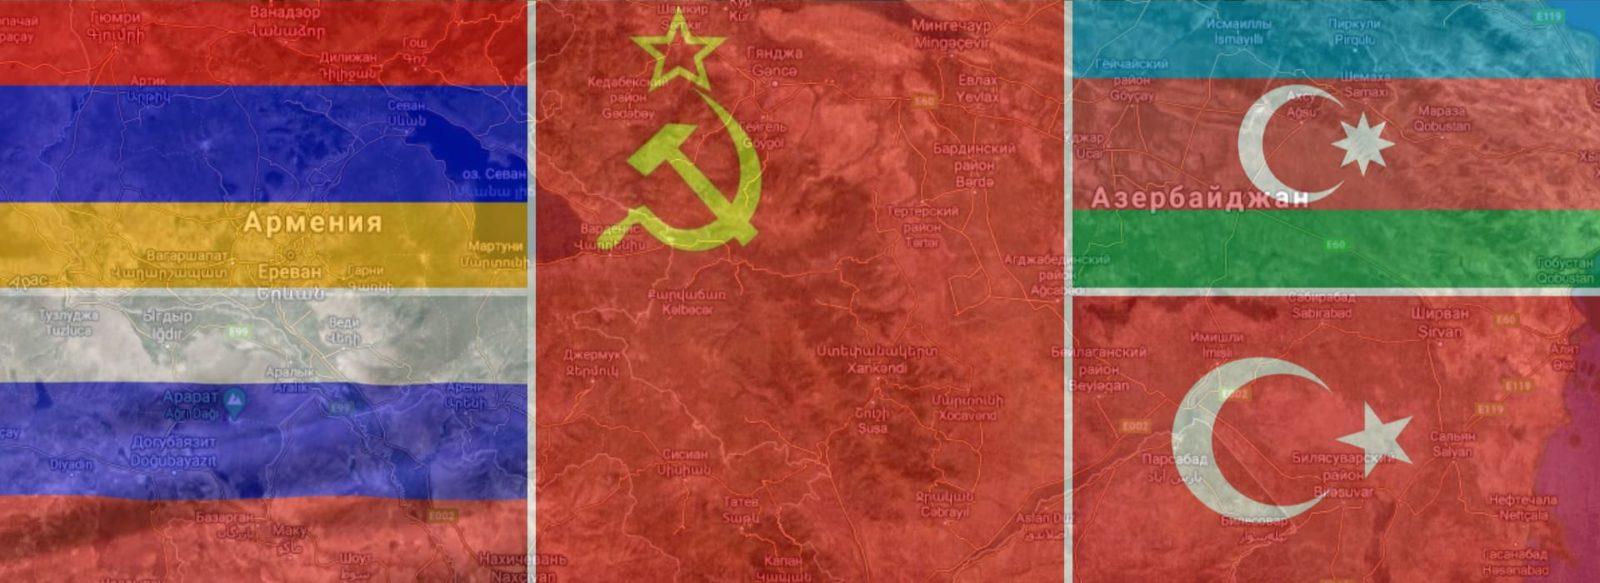 участники карабахского конфликта